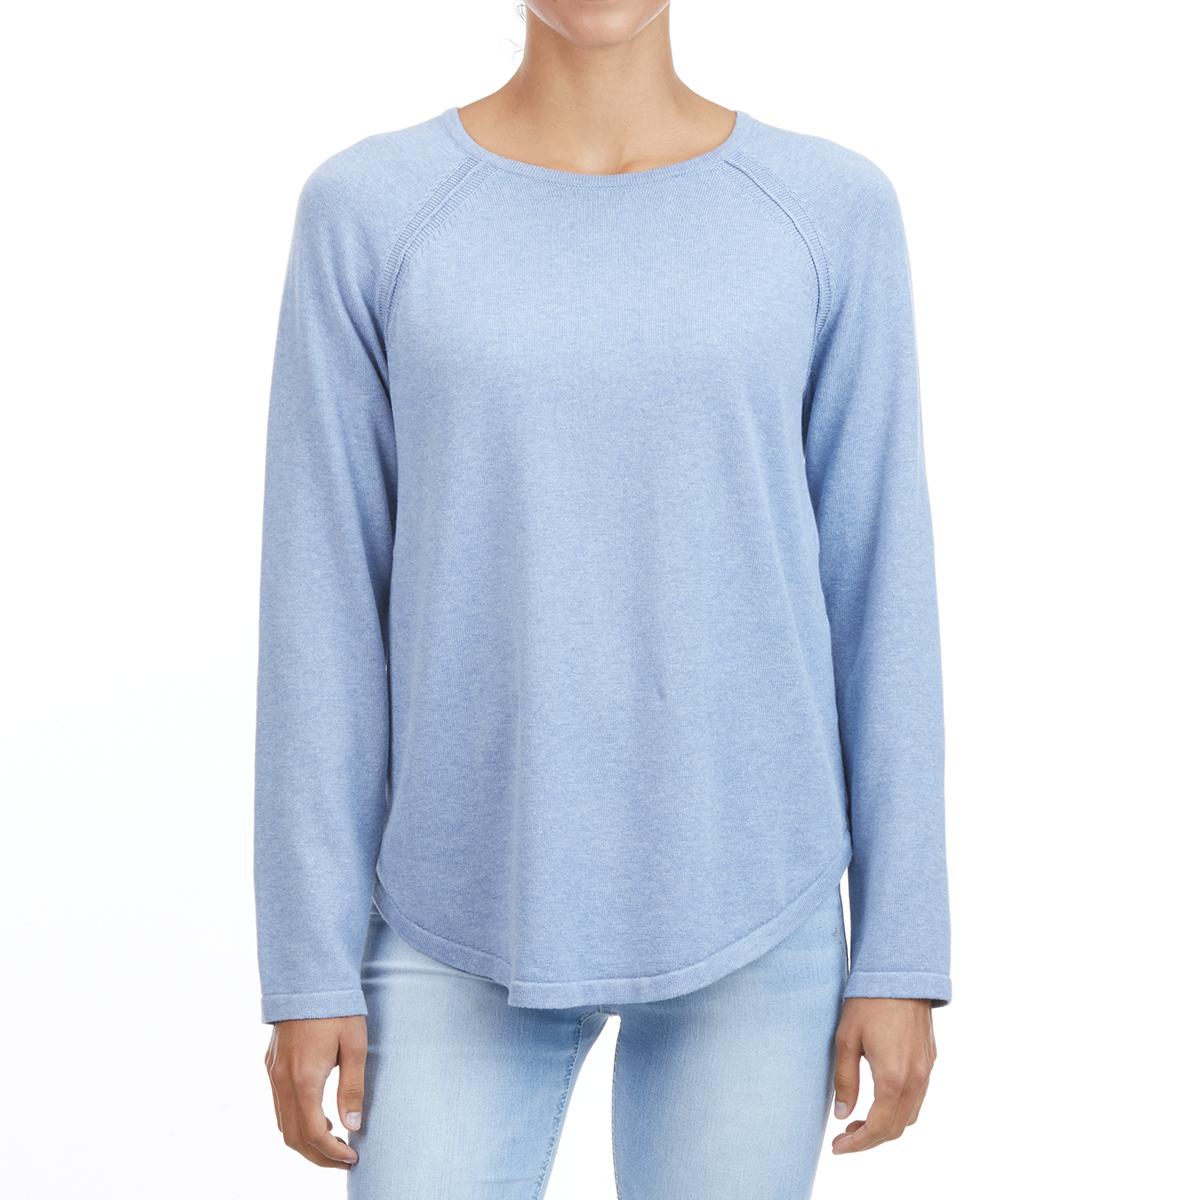 Jeanne Pierre Women's Cotton Crew Shirttail Sweater - Blue, XL